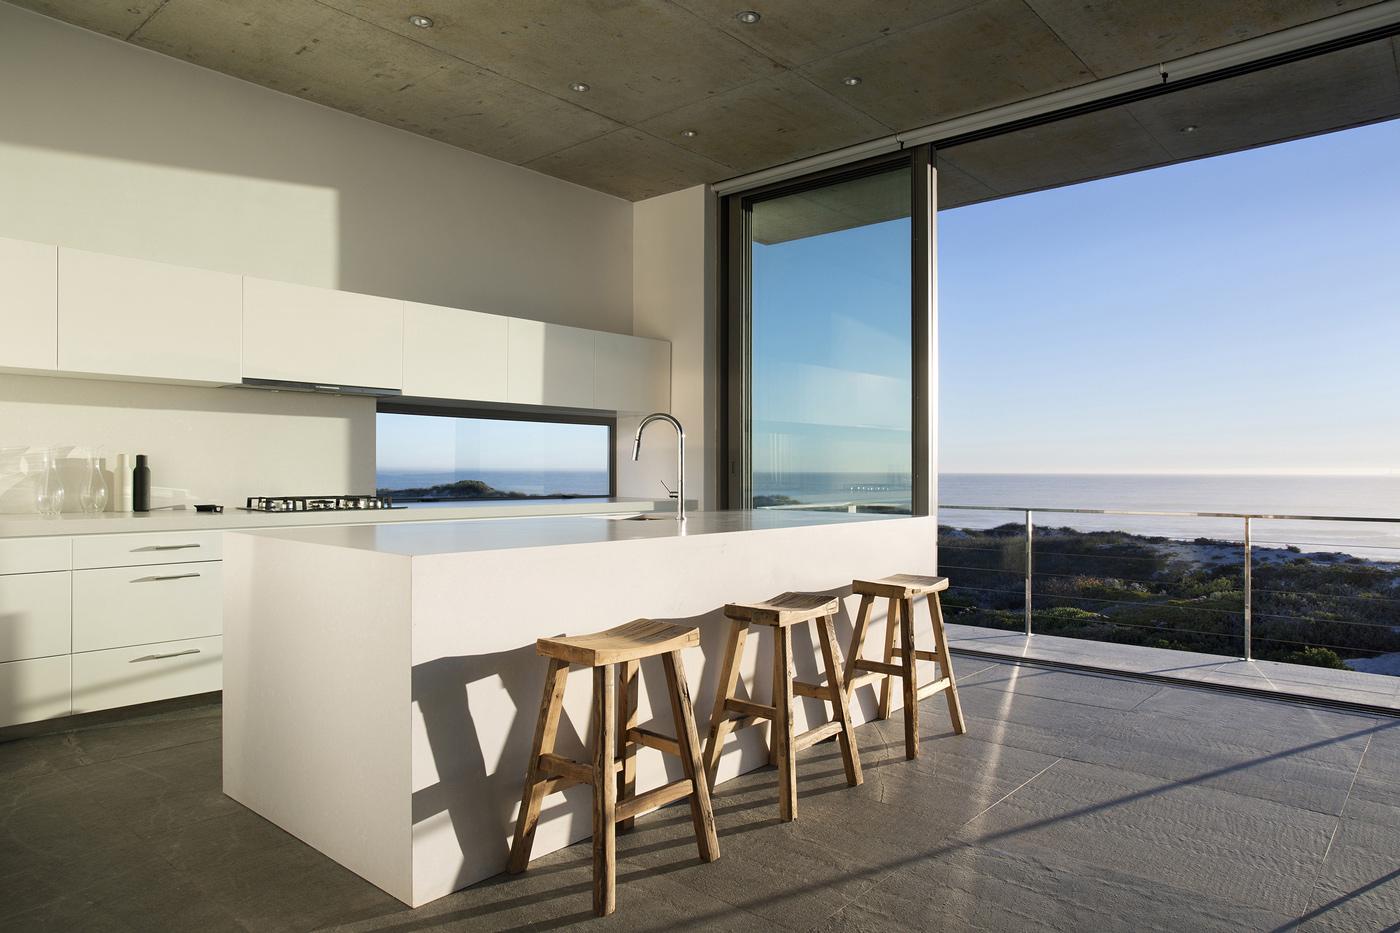 Kitchen Island, Breakfast Bar, Glass Sliding Doors, Holiday Home in Yzerfontein, South Africa